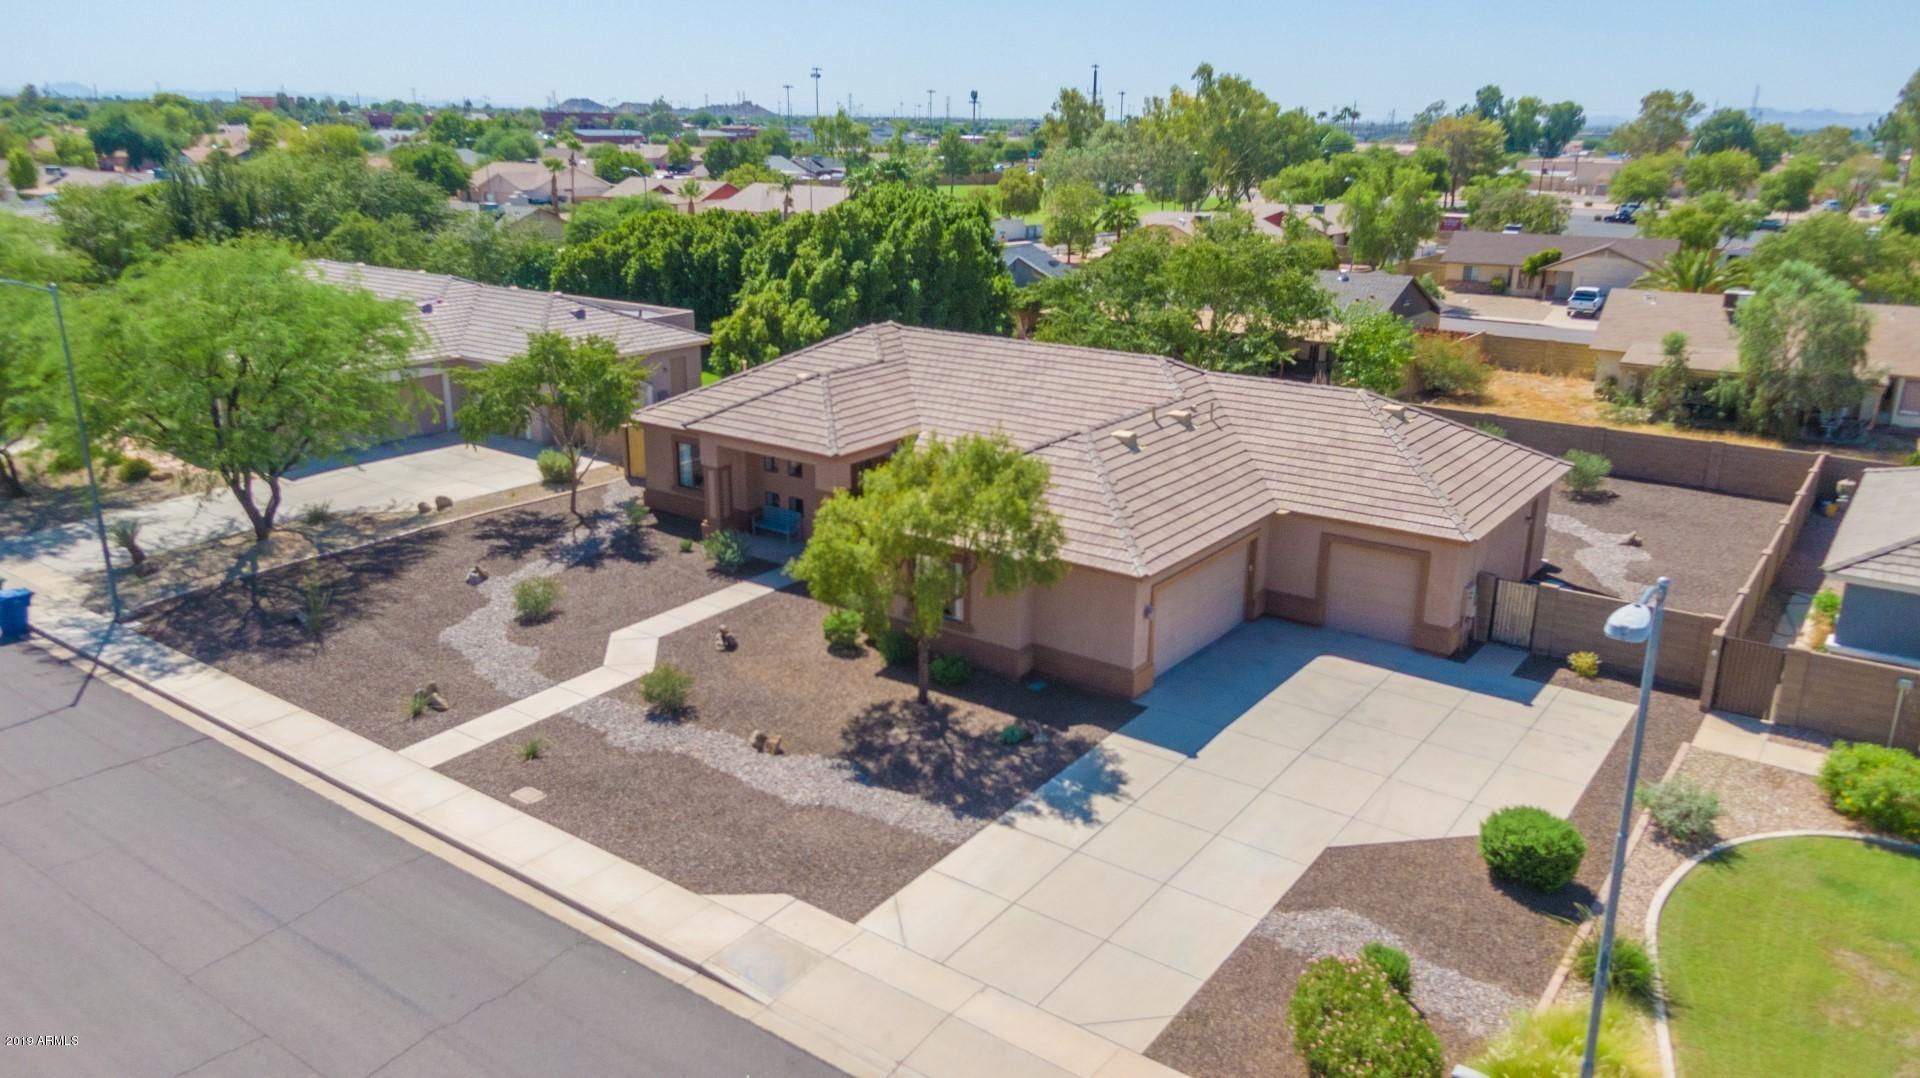 MLS 5968947 6951 E GRANDVIEW Street, Mesa, AZ 85207 Mesa AZ Alta Mira Estates